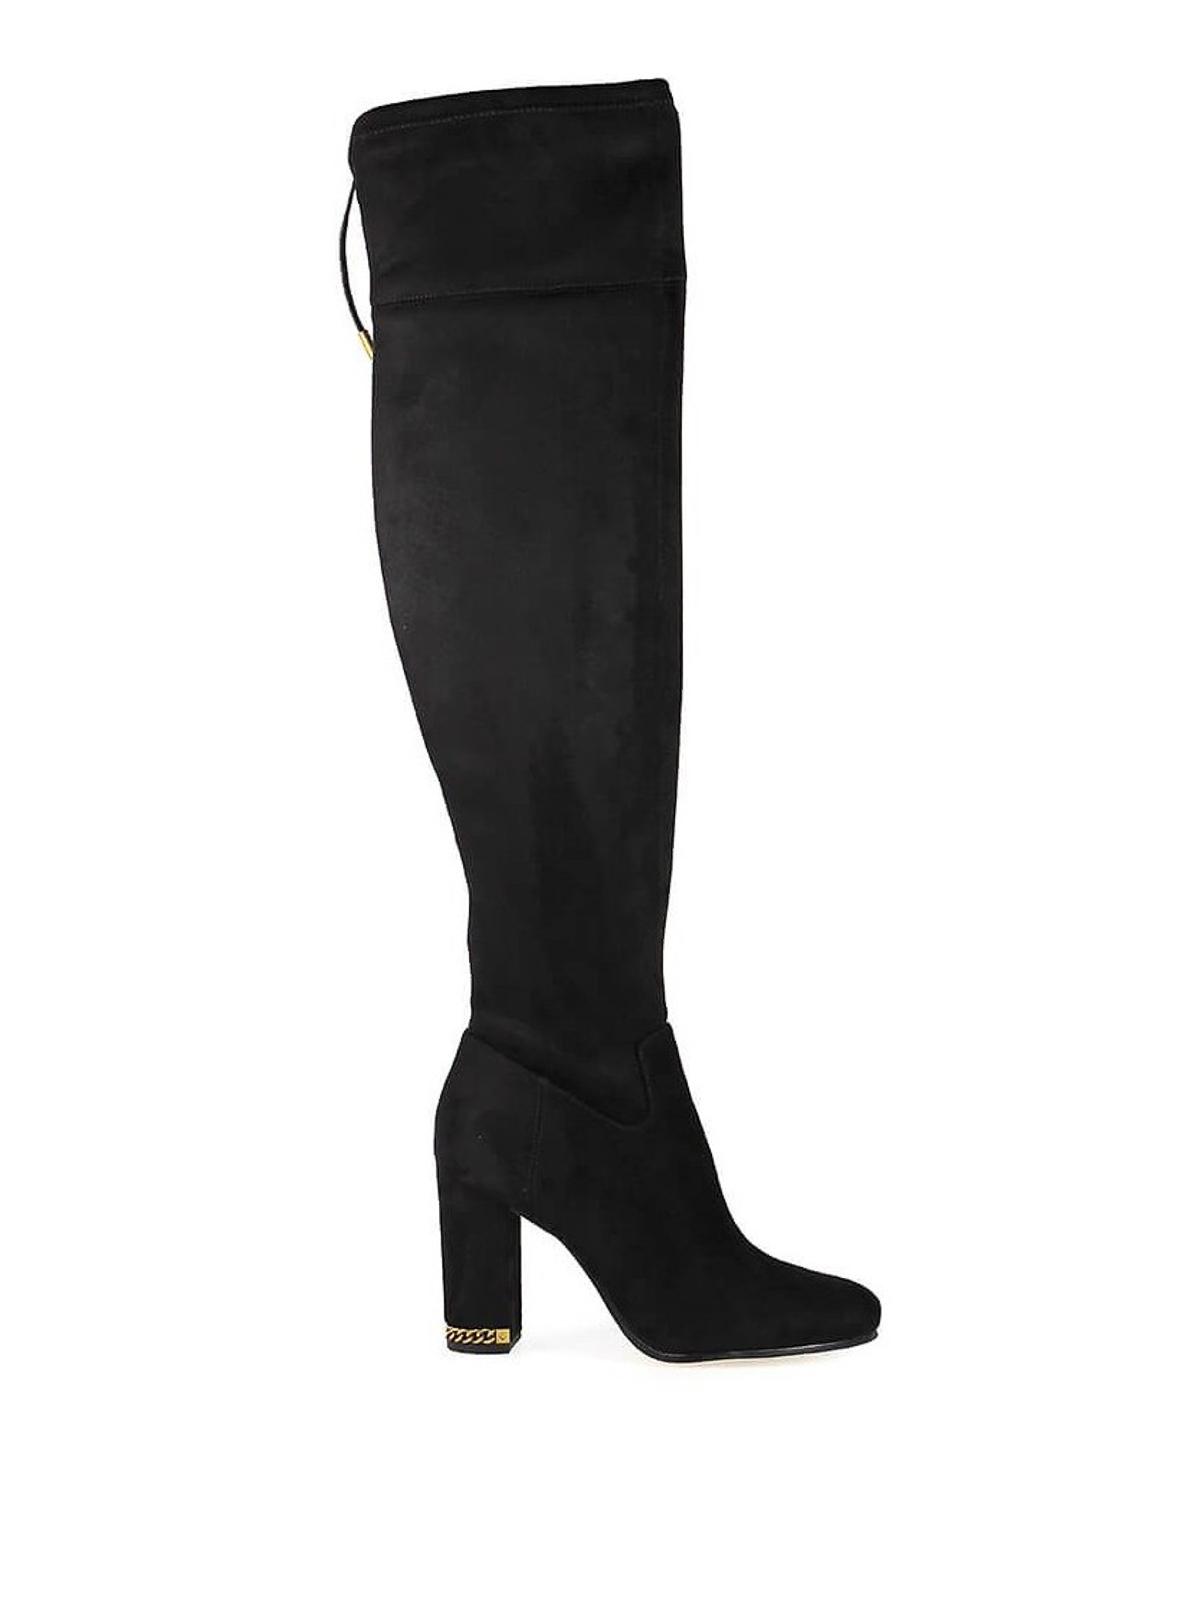 415d48ca636 Michael Kors - Jamie Stretch suede-like block heel boots - boots ...